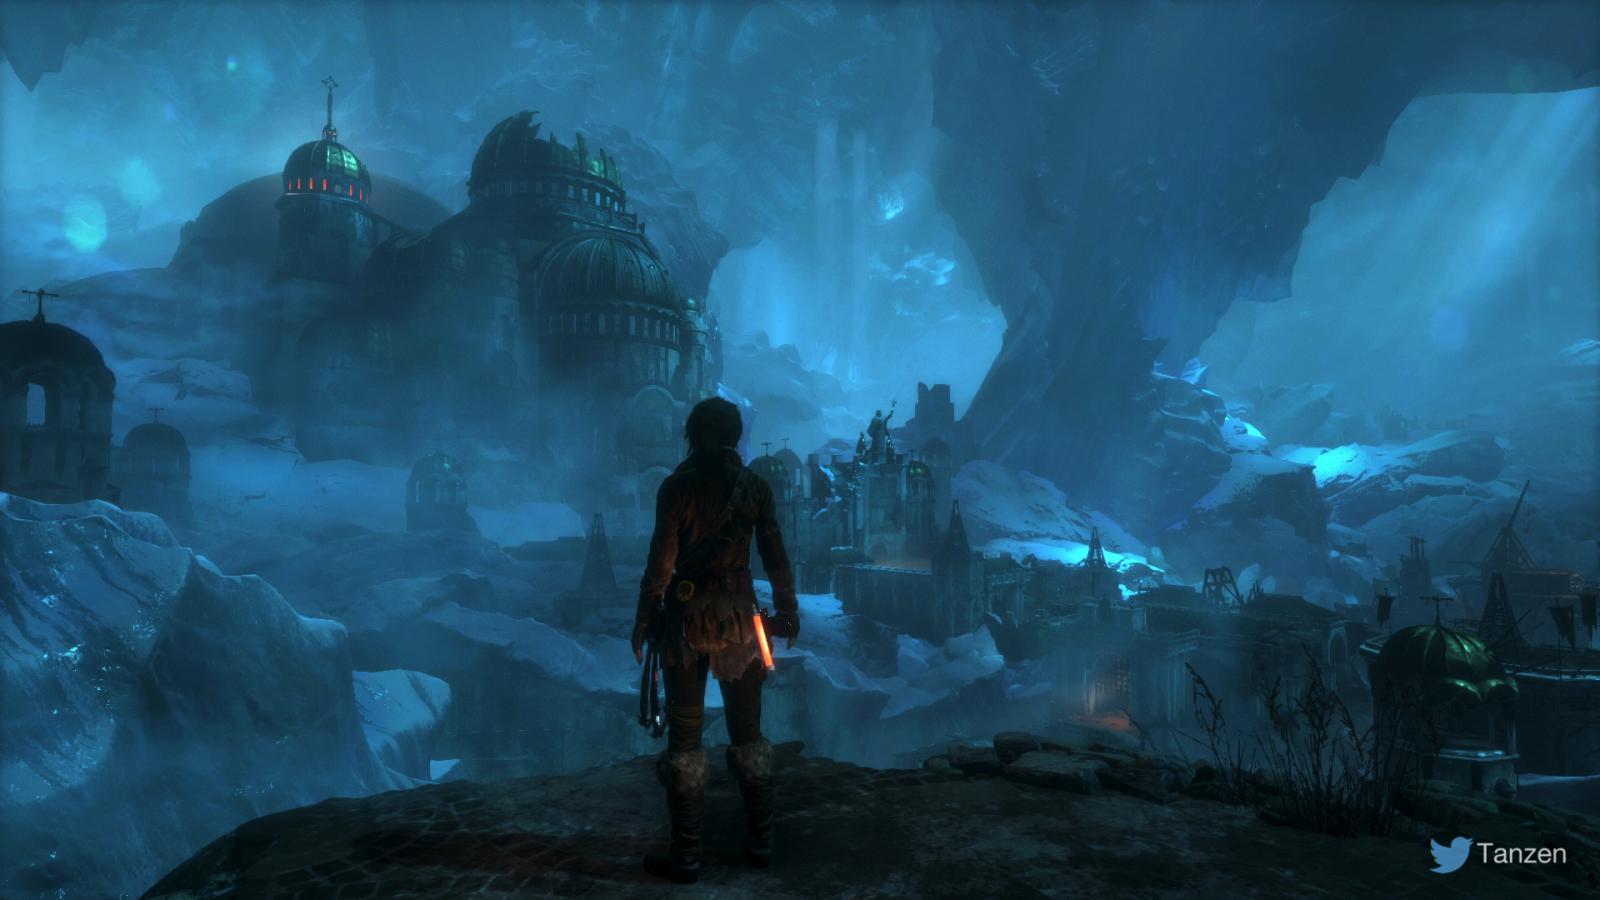 Rise of the Tomb Raider Screen Shot 09.11.15 20.05_watermark